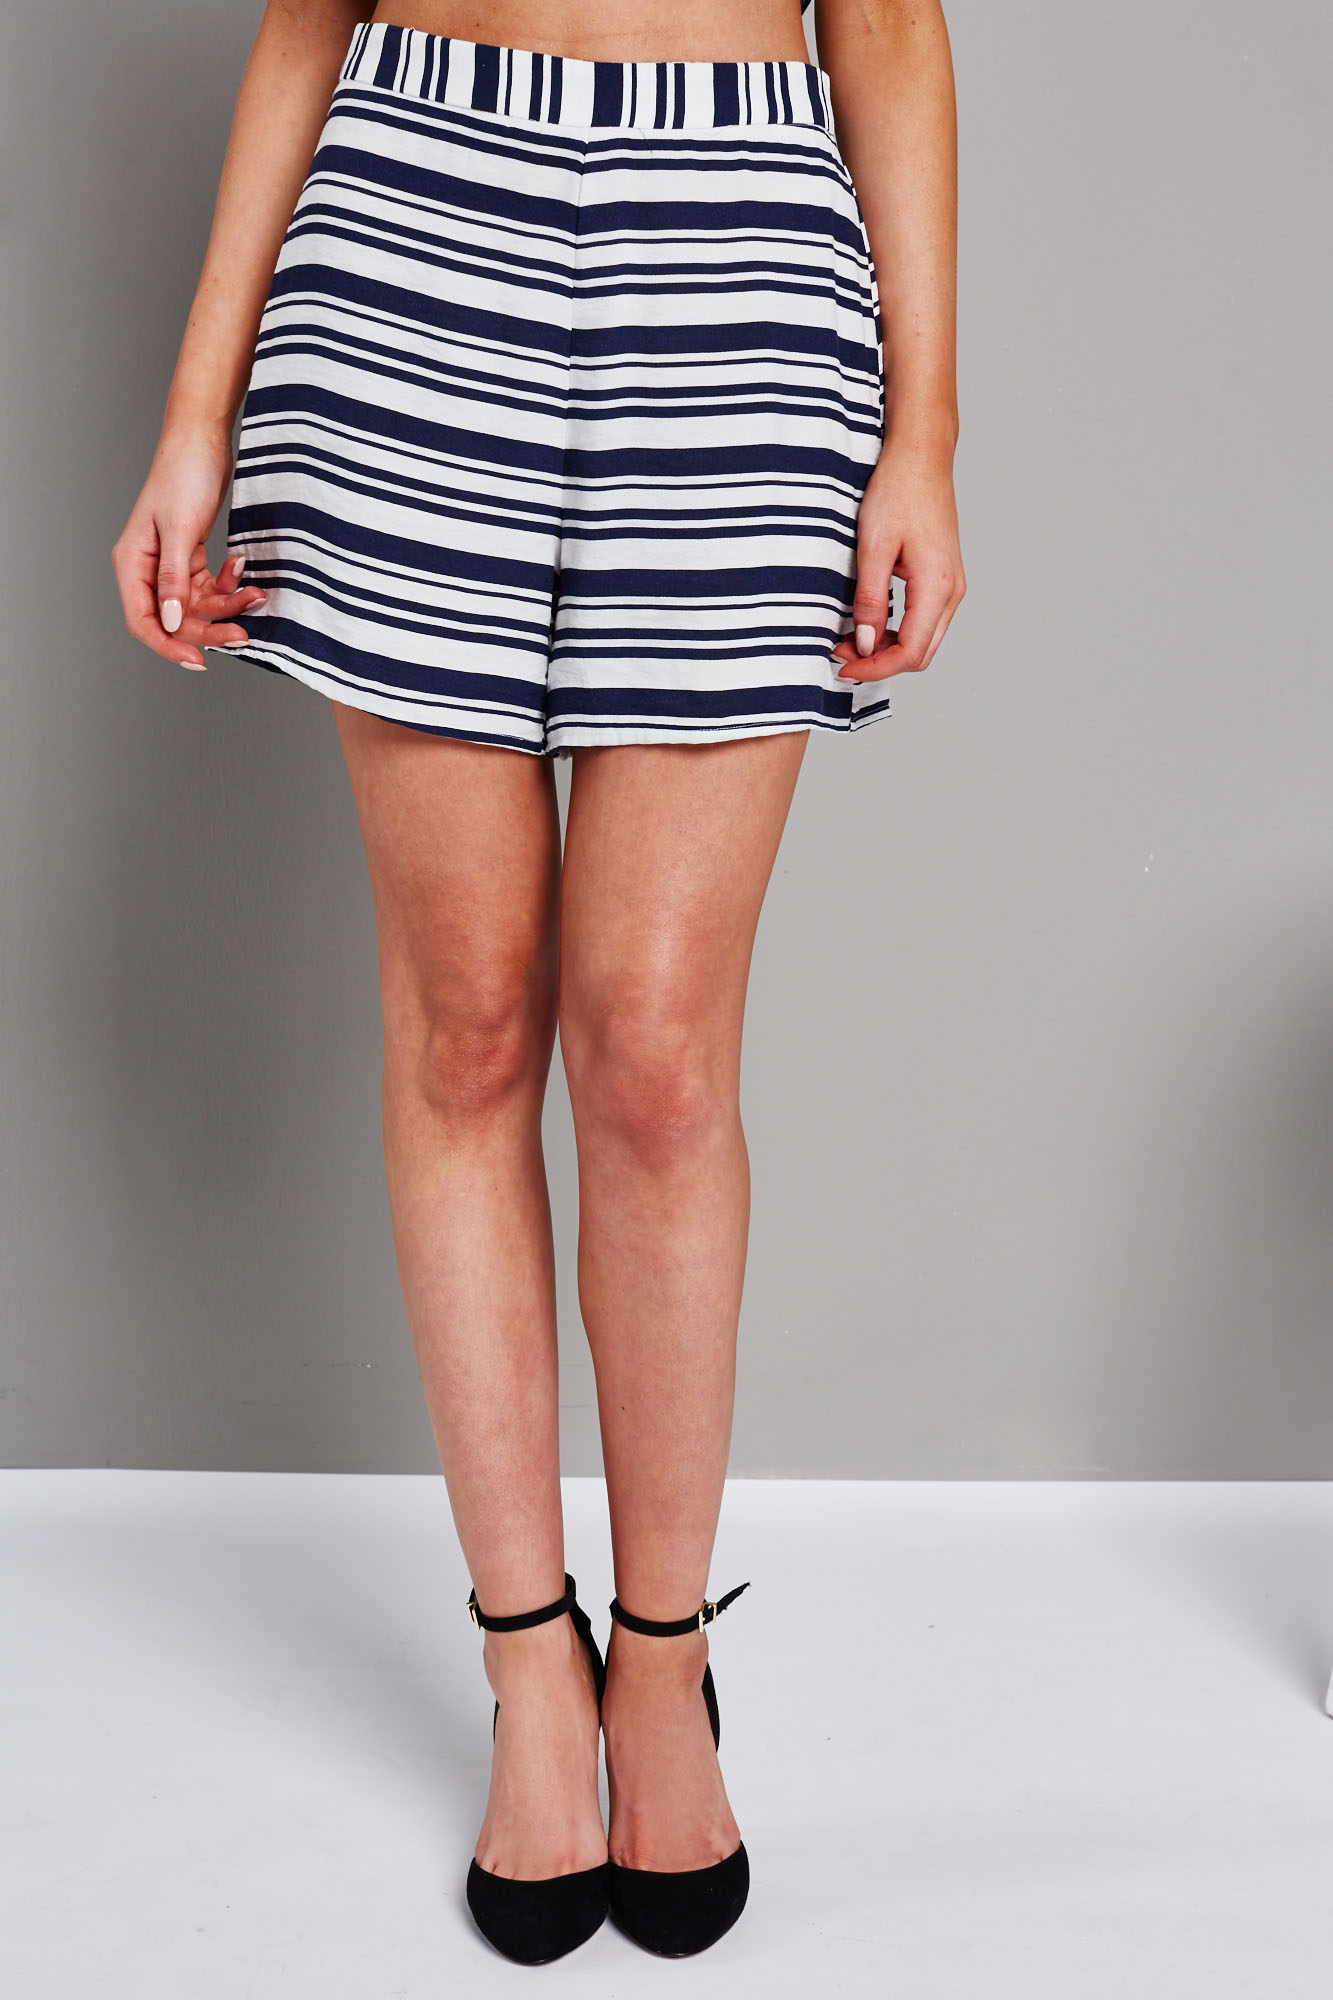 Glamorous Ladies White and Navy Striped Tailored Shorts | eBay